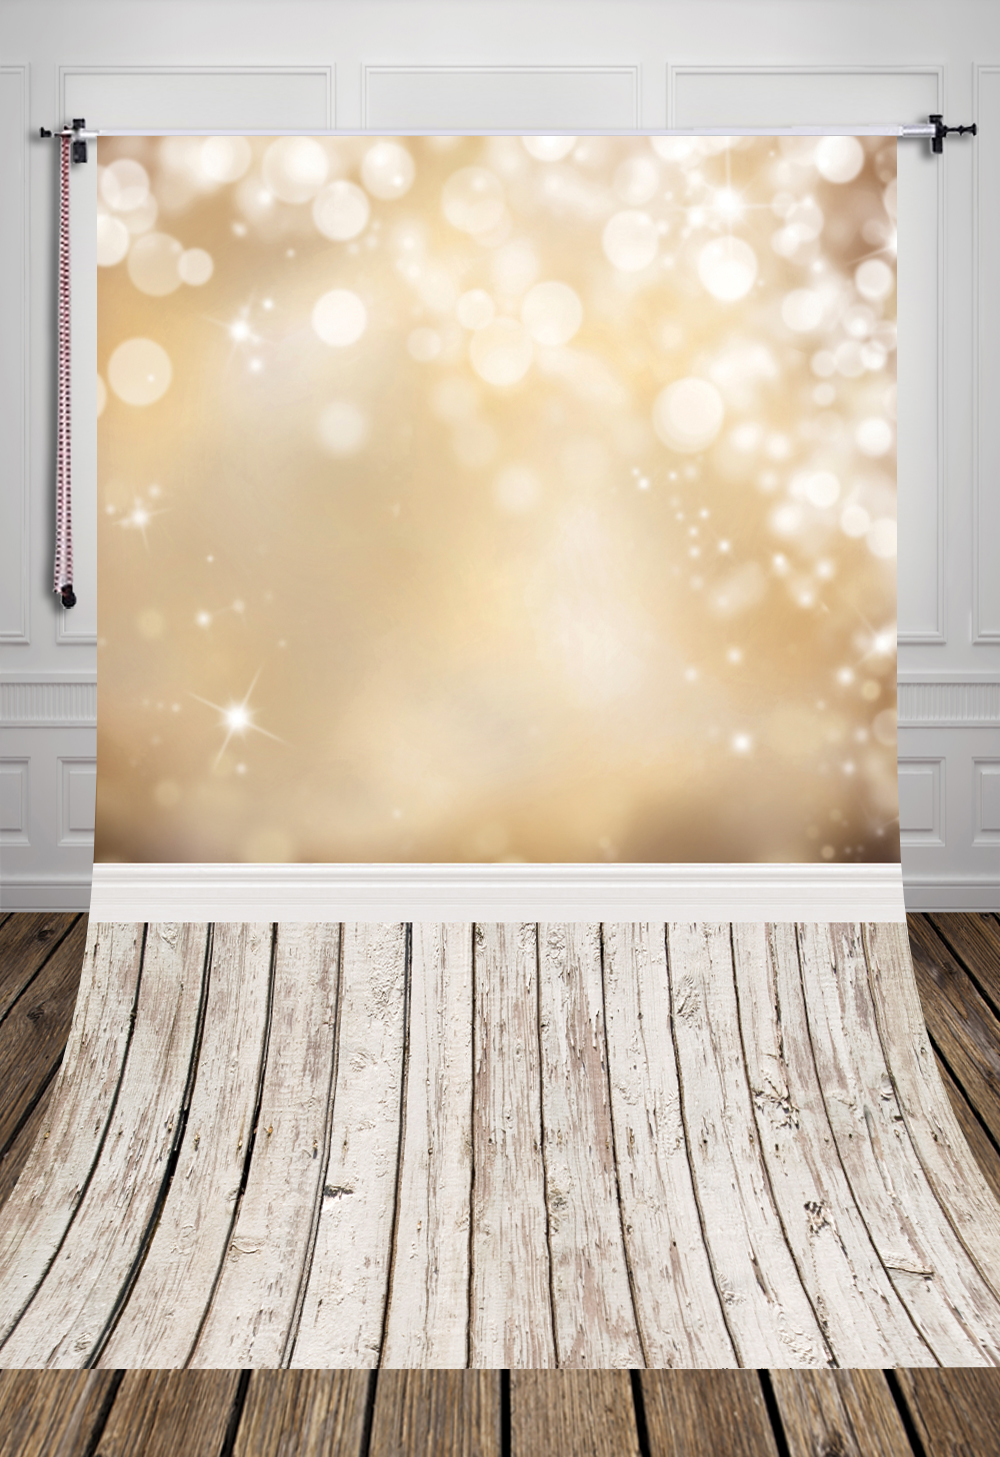 5x7ft (1.5x2.2m) golden bottom glitter bokeh and white wood floor printed studio photography backdrops backgrounds D-040